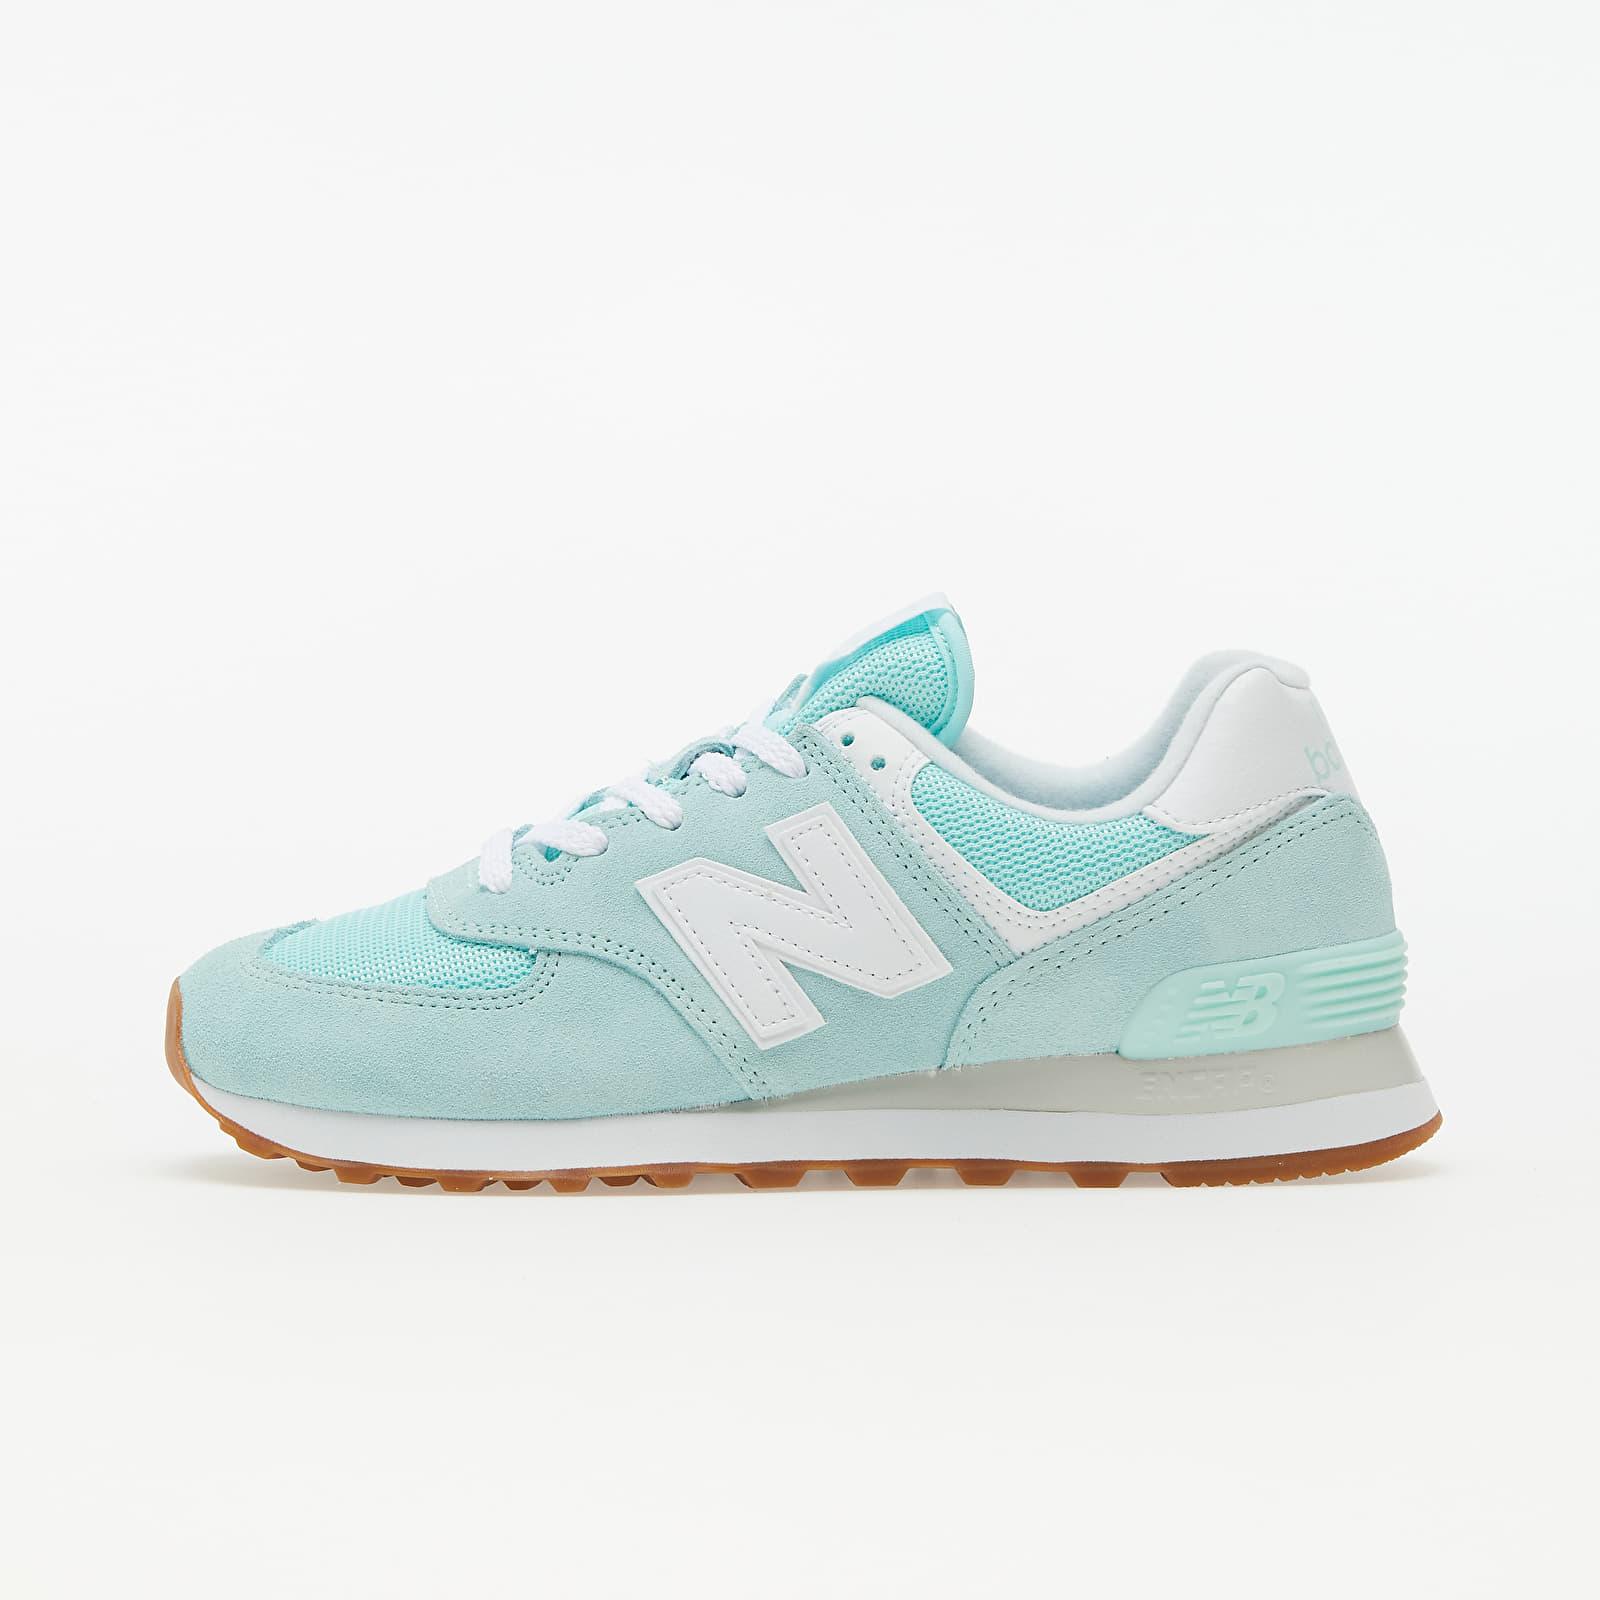 New Balance 574 Turquoise WL574PS2